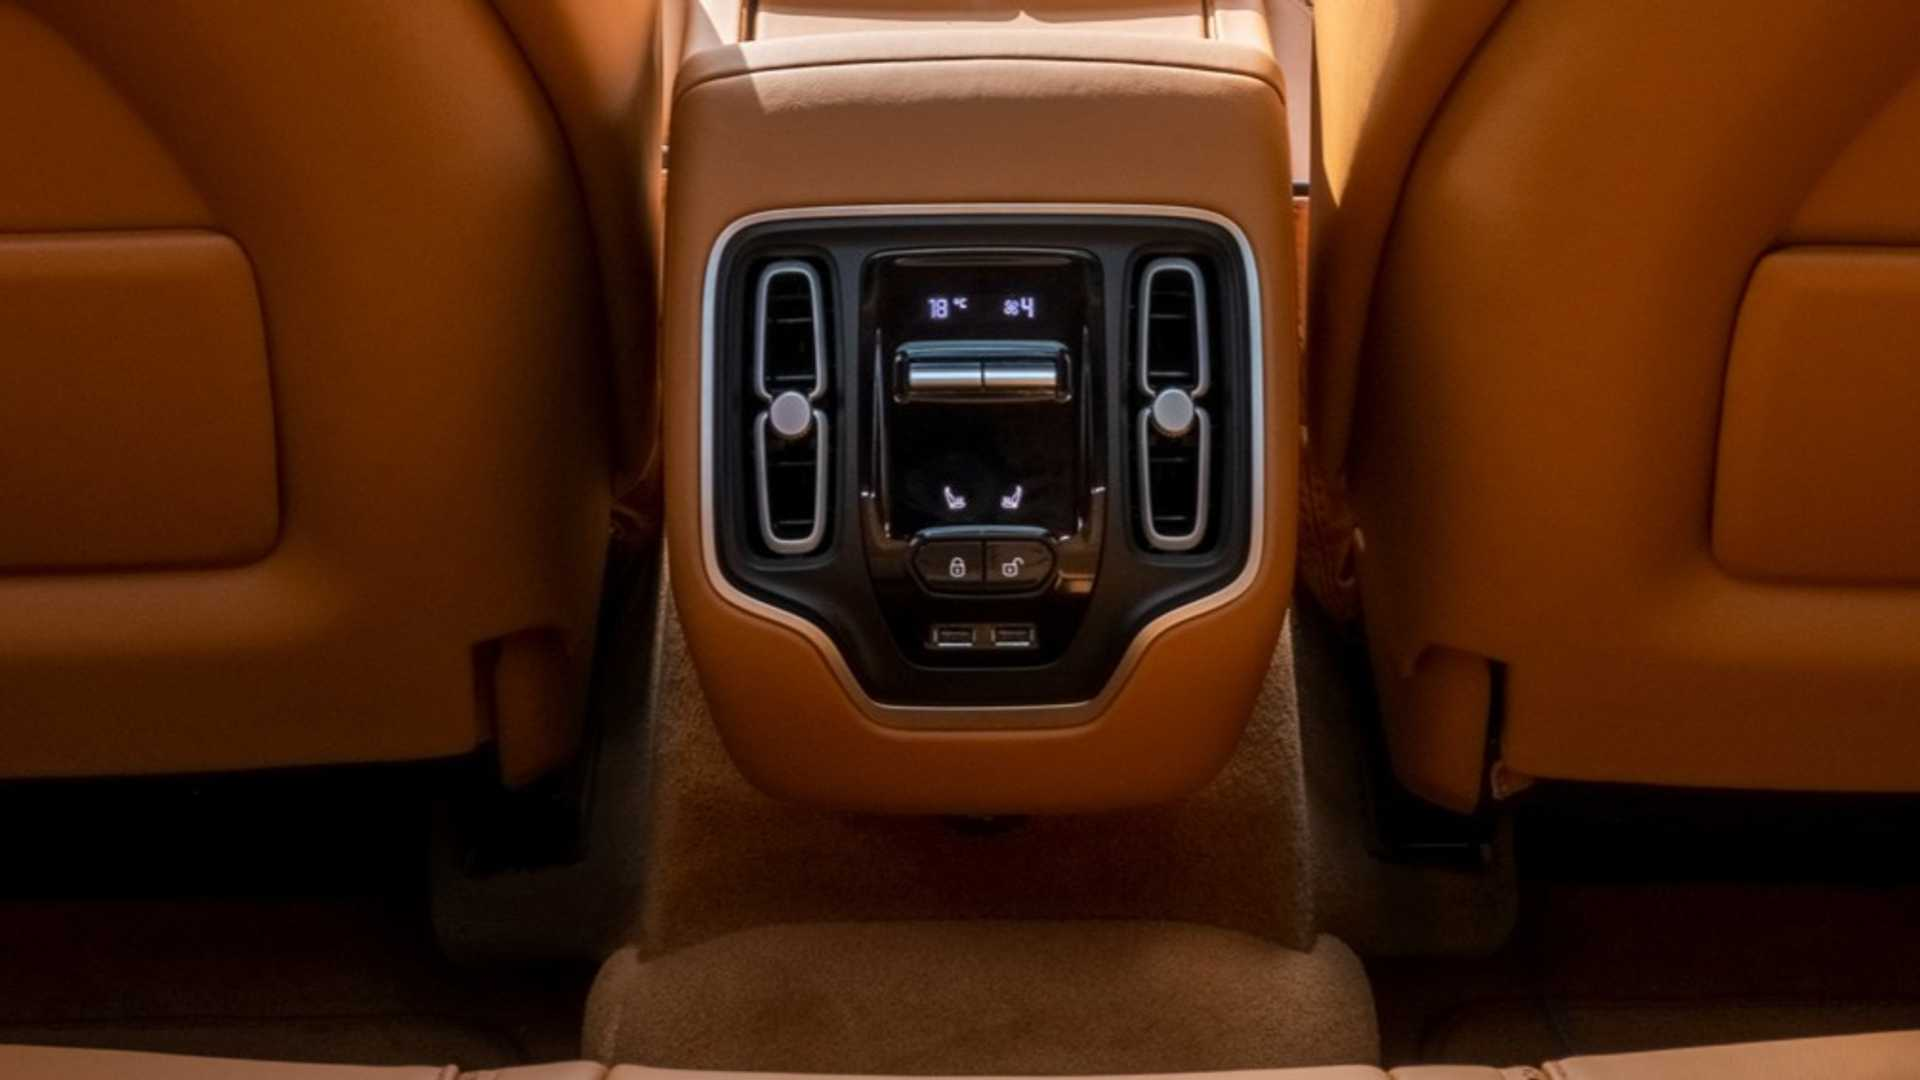 Aston Martin Dbx Interior Insideevs Italia Foto